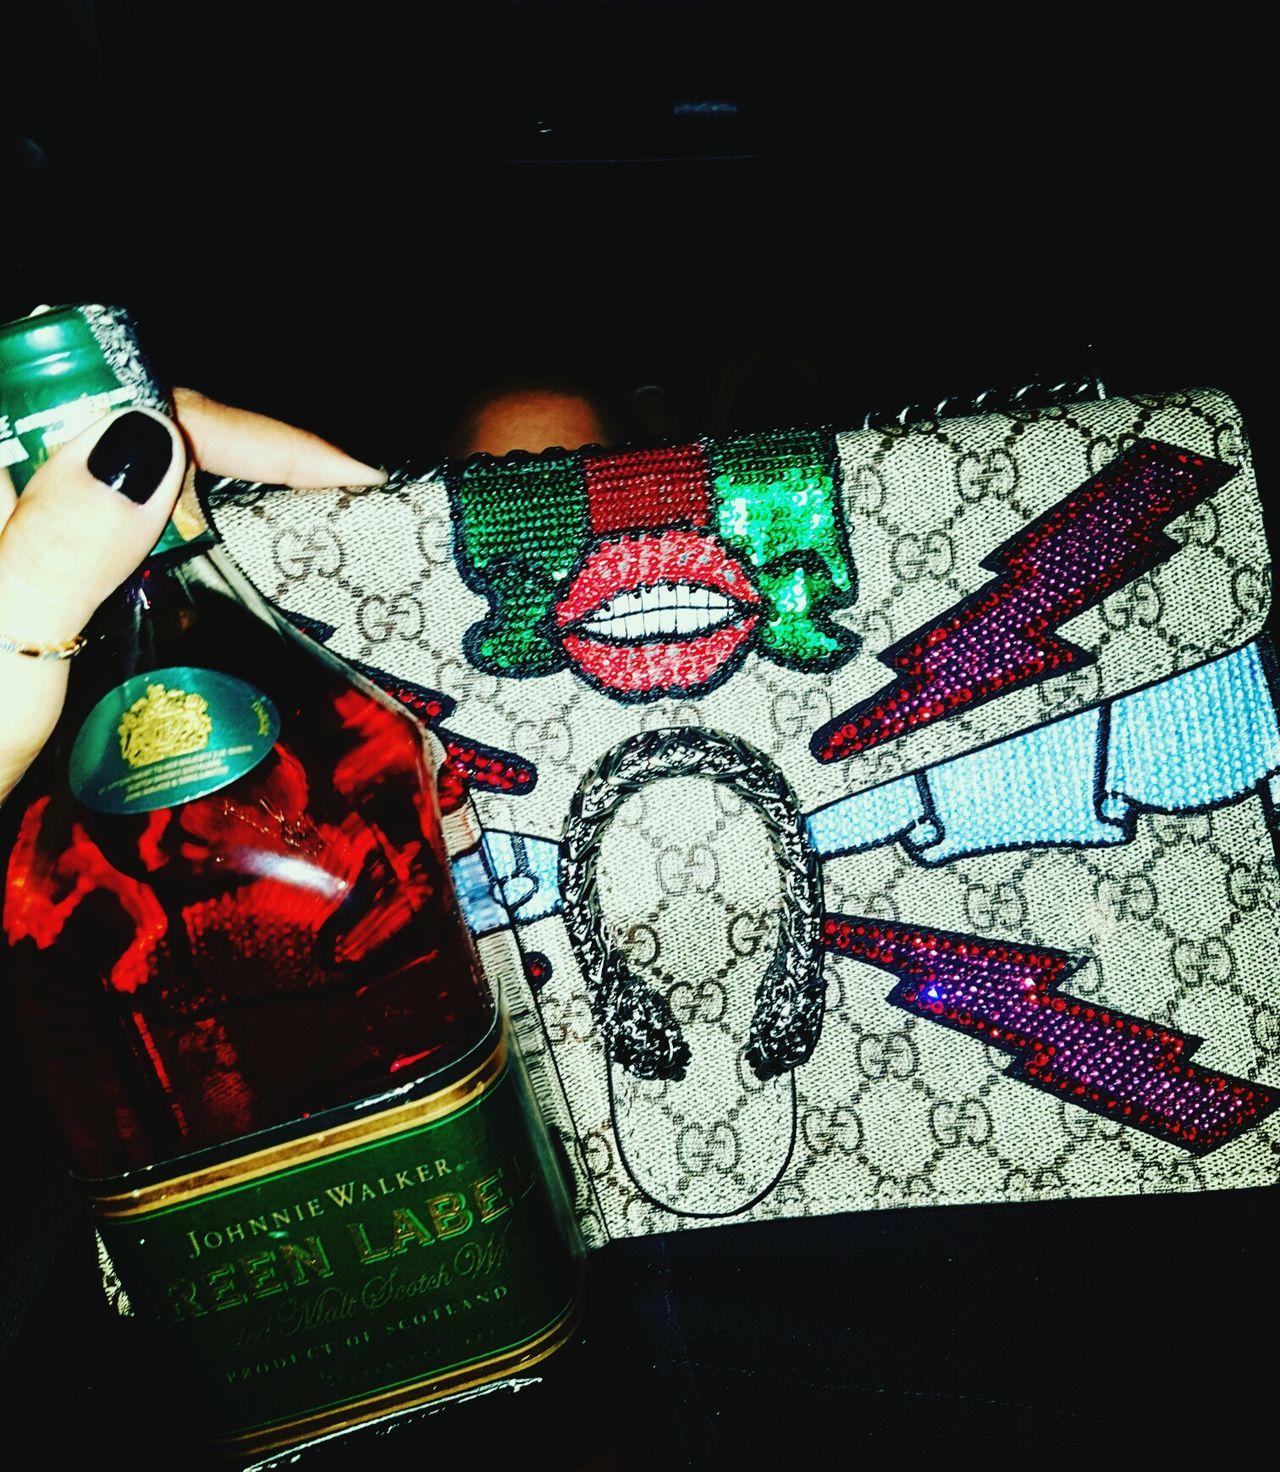 GUCCI Bags Wisk Green Label Bolsa Amo❤ Fashion